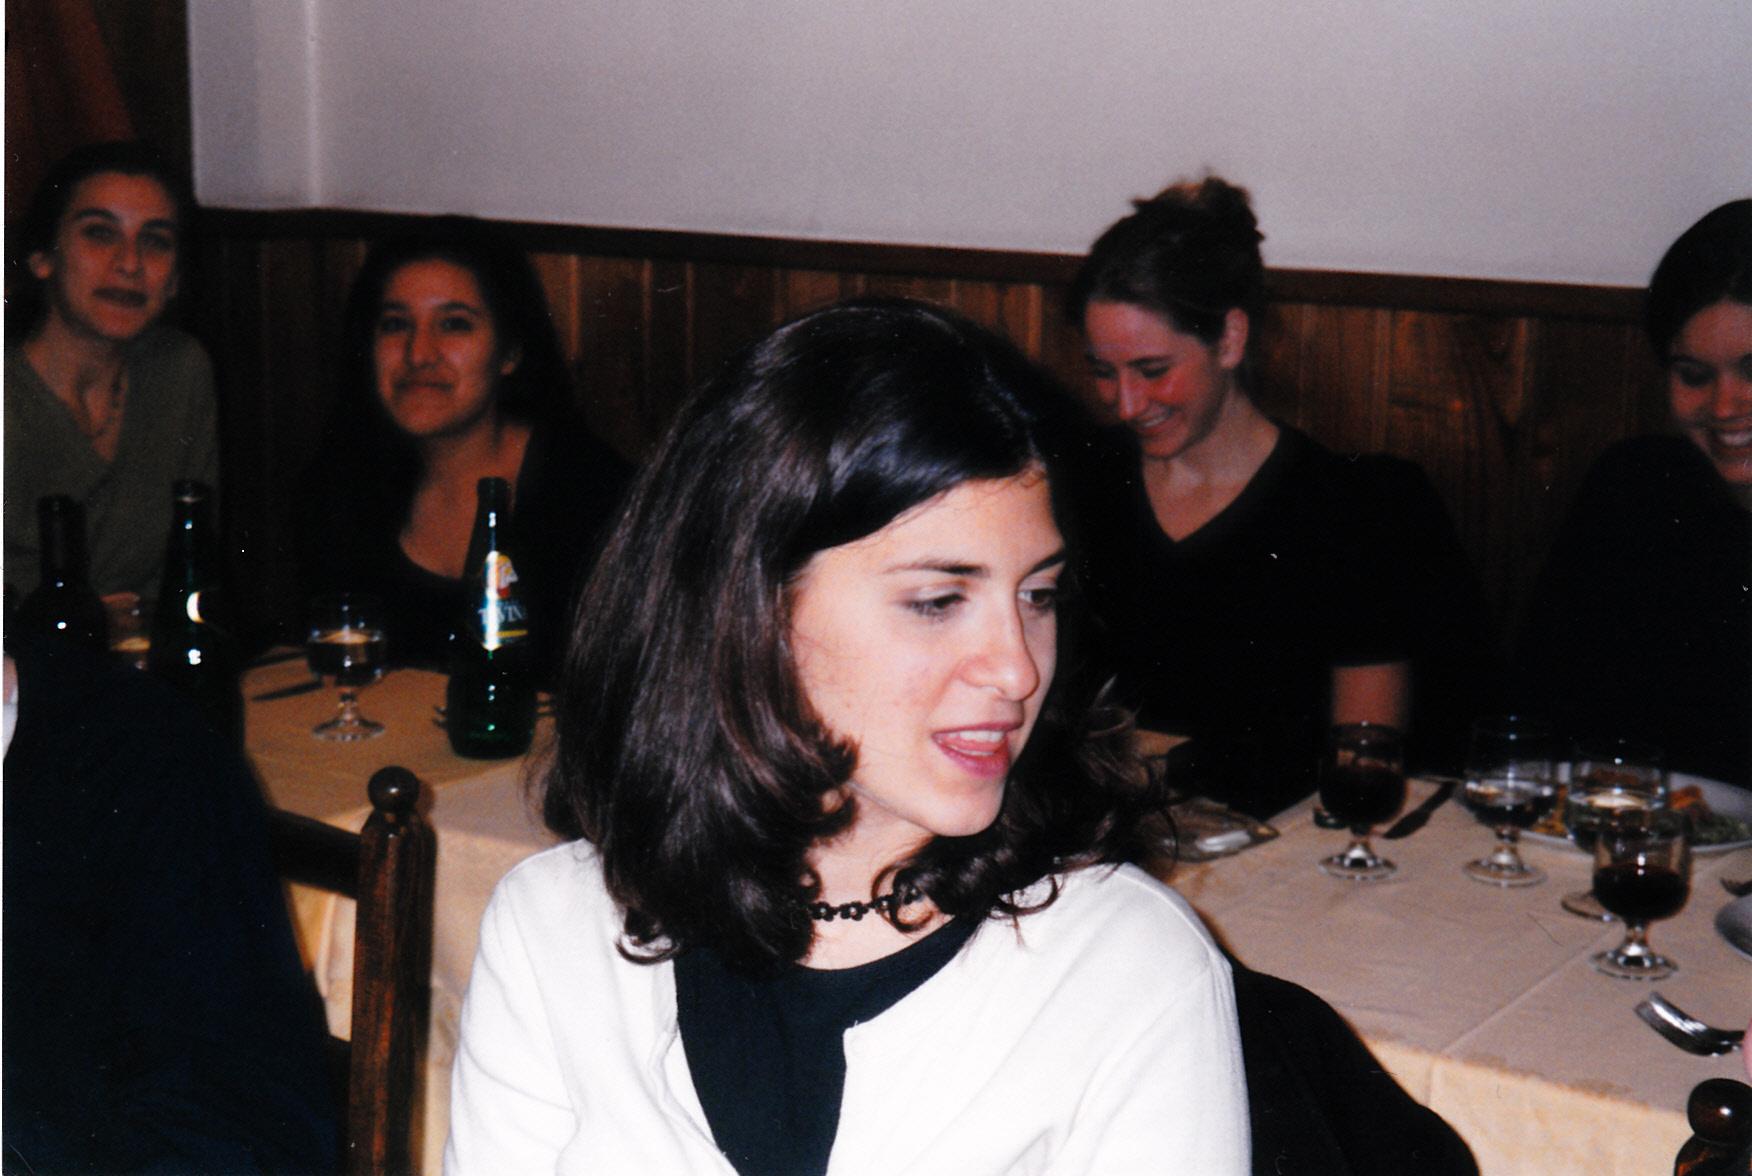 Photos 3 and 4 Bologna 98-992